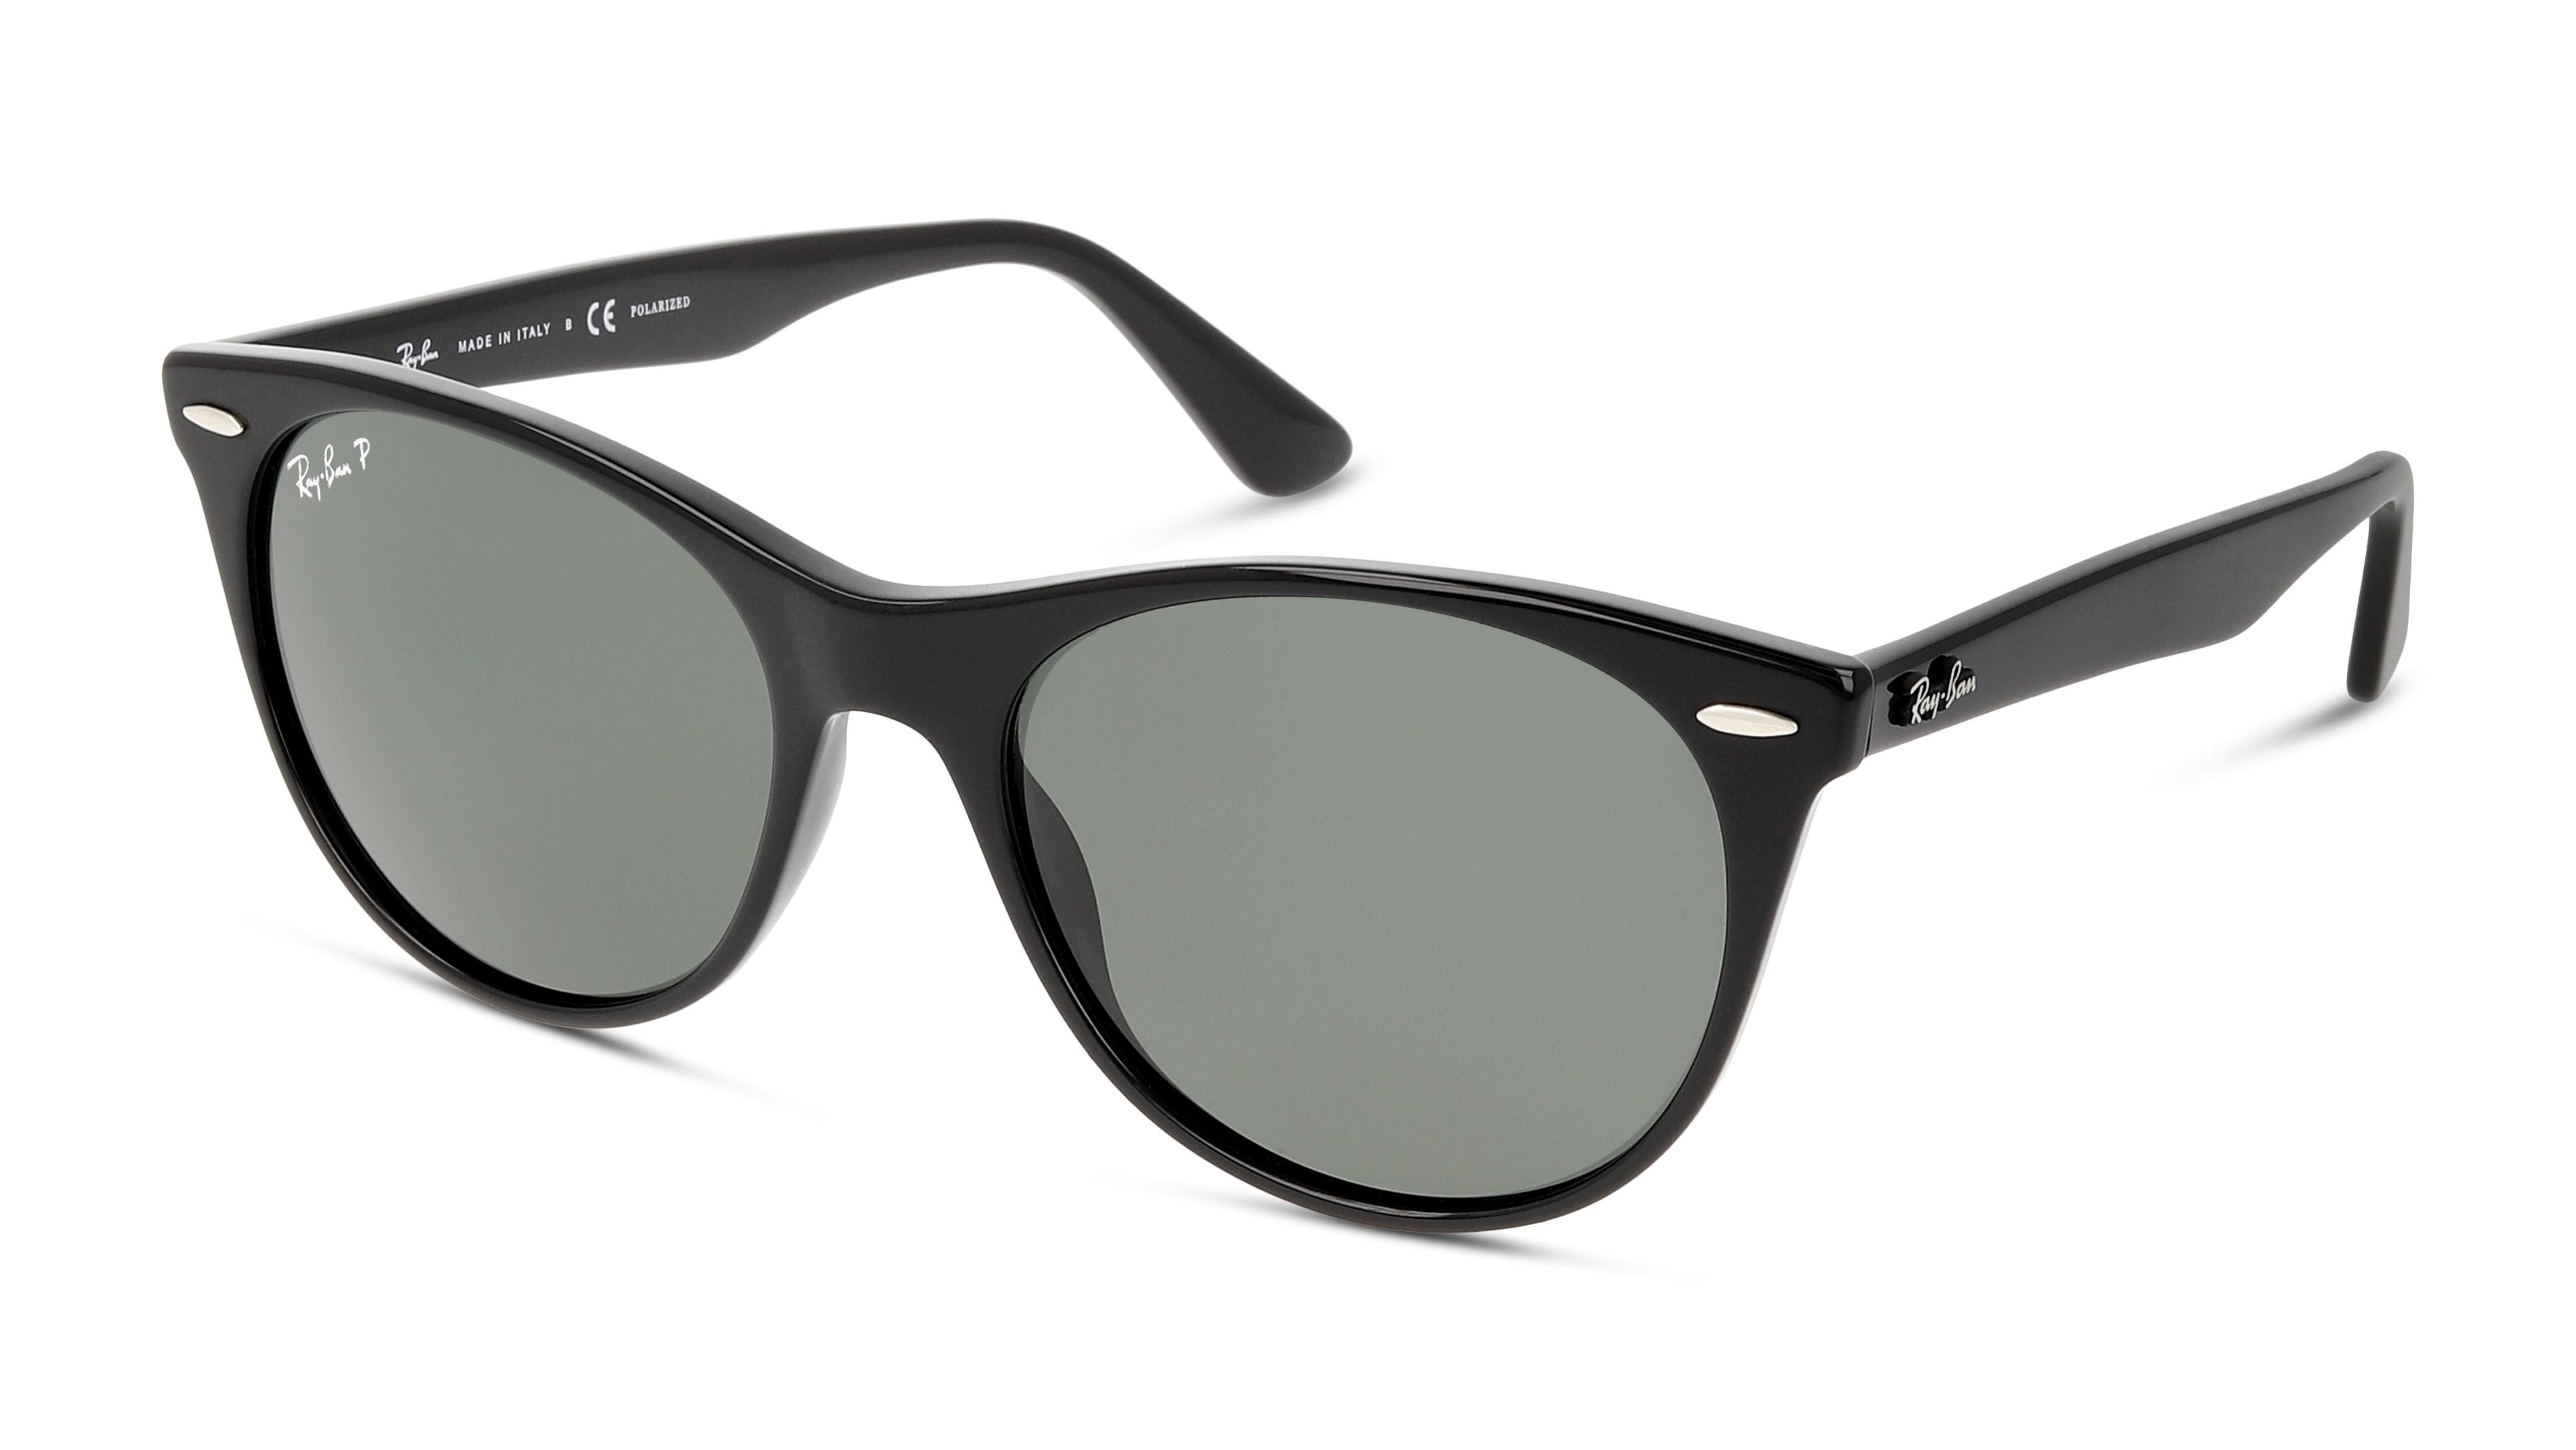 8056597044578-angle-03-ray-ban-0rb2185-eyewear-black